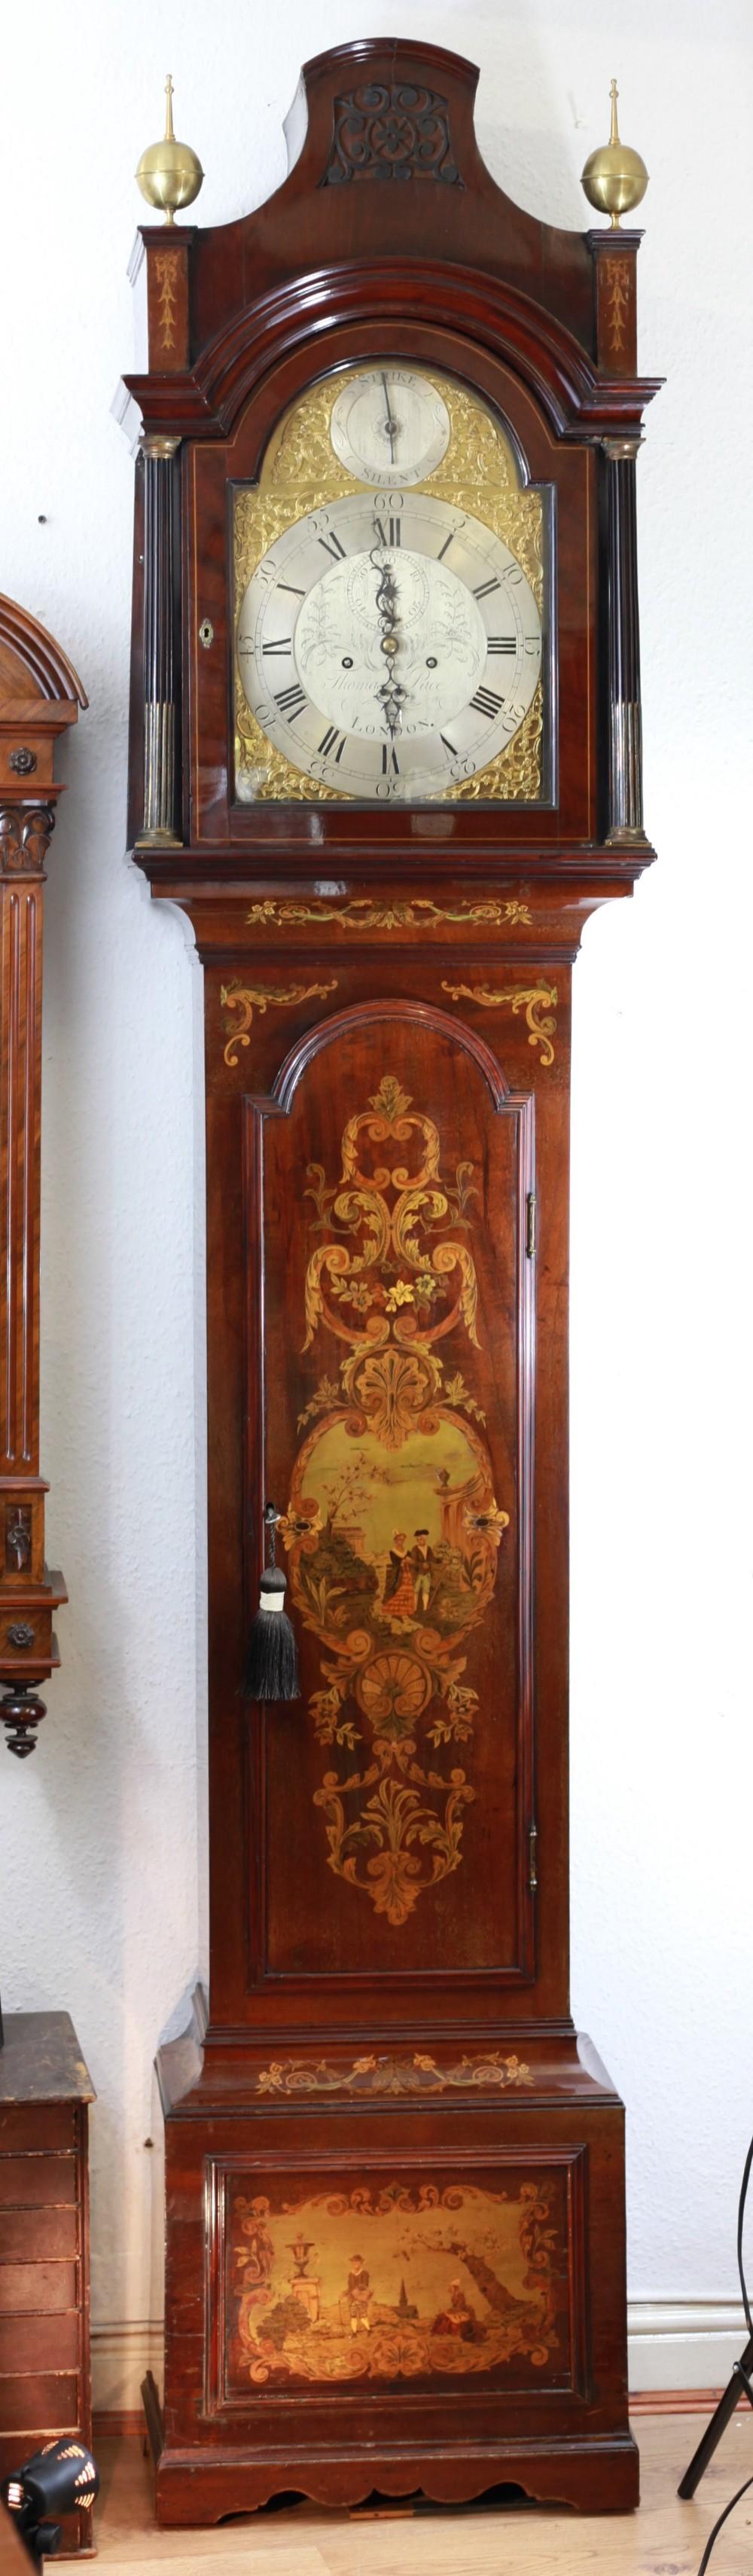 18th century inlaid longcase clock by thomas pace london